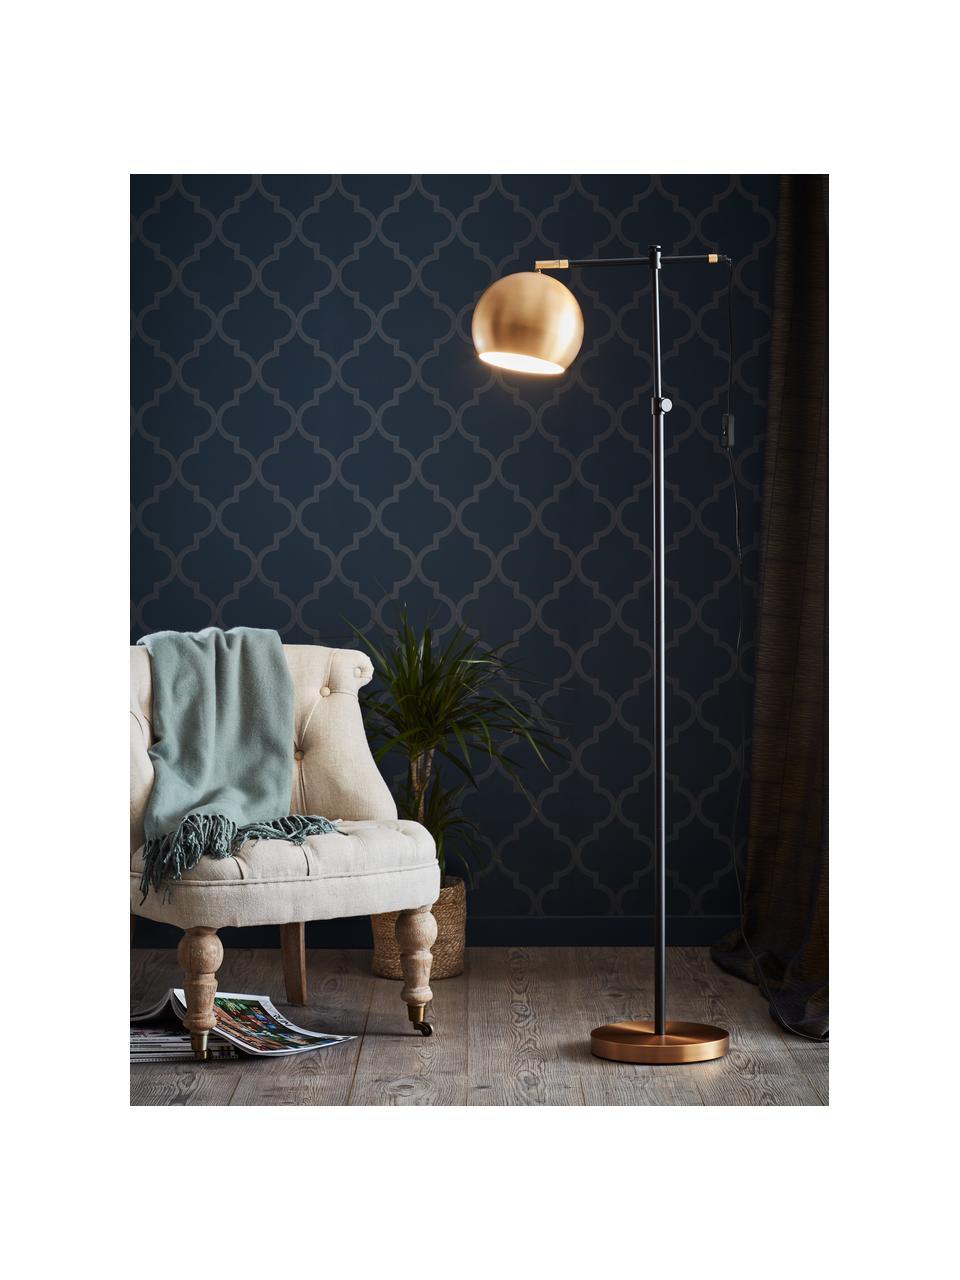 Kleine industriële leeslamp Chester van metaal, Frame: gelakt messing, Lampvoet: messing, Bruin, zwart, 54 x 135 cm